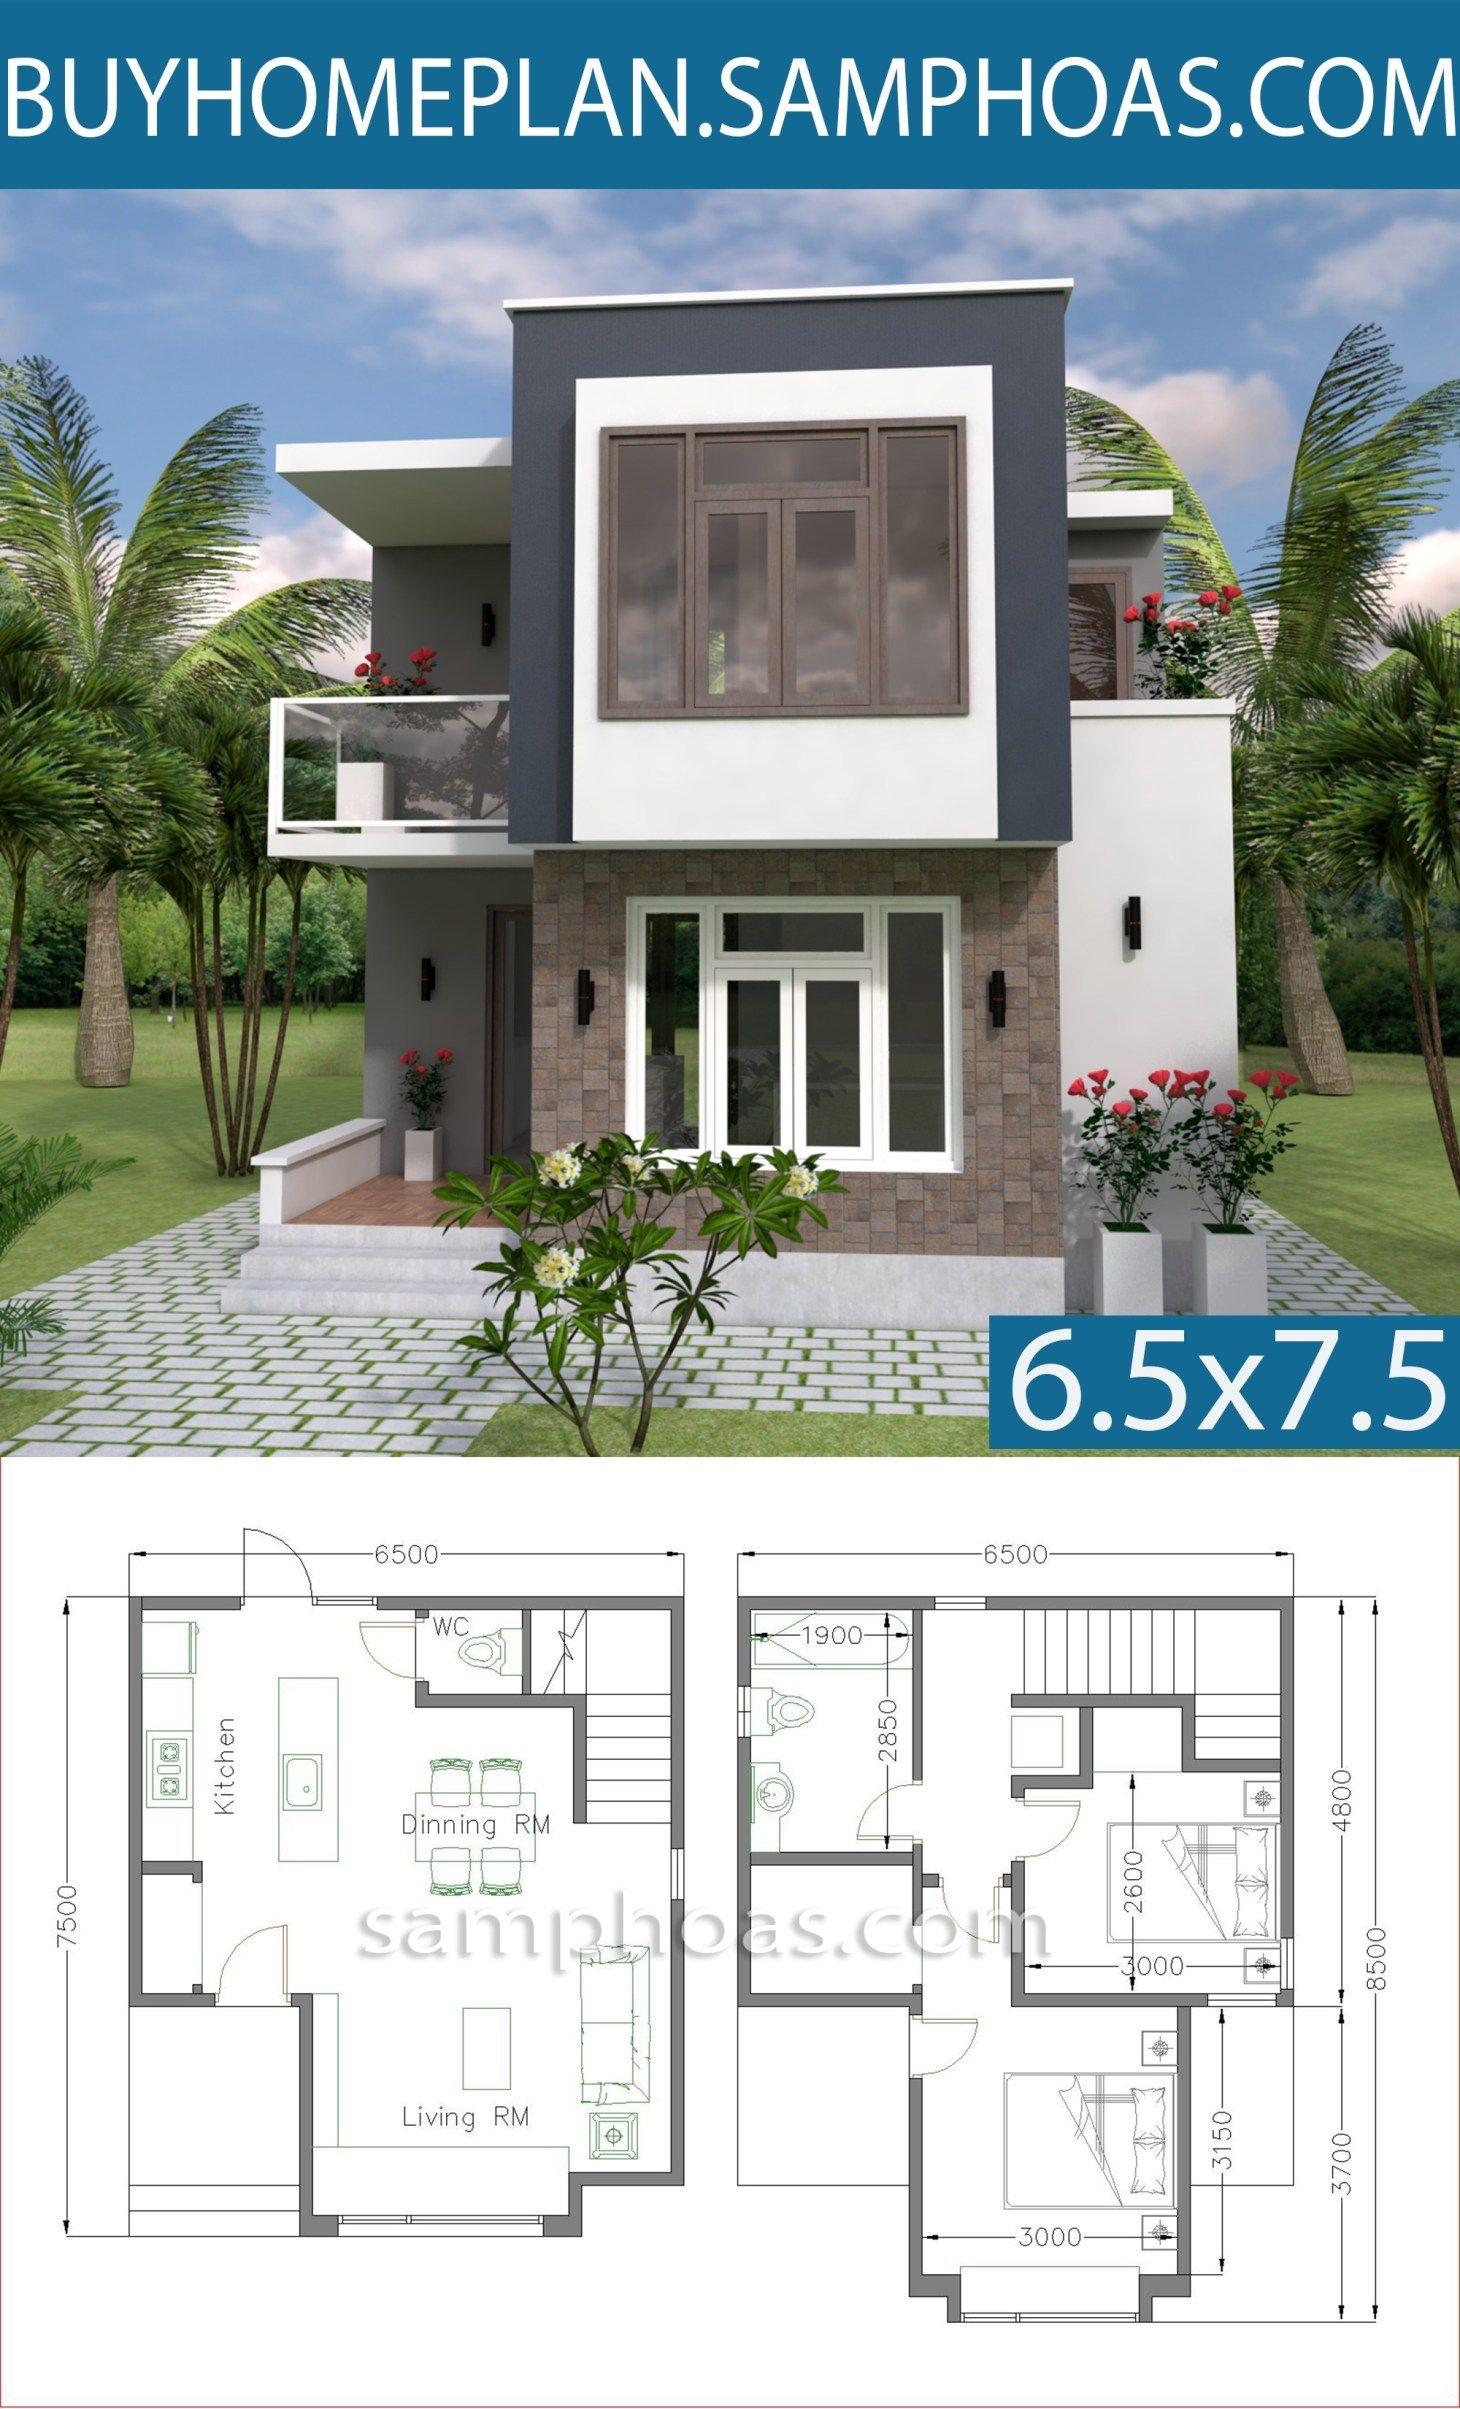 Small House Design With Full Plan 6 5x7 5m Samphoas Com Small House Design House Design Dream House Plans